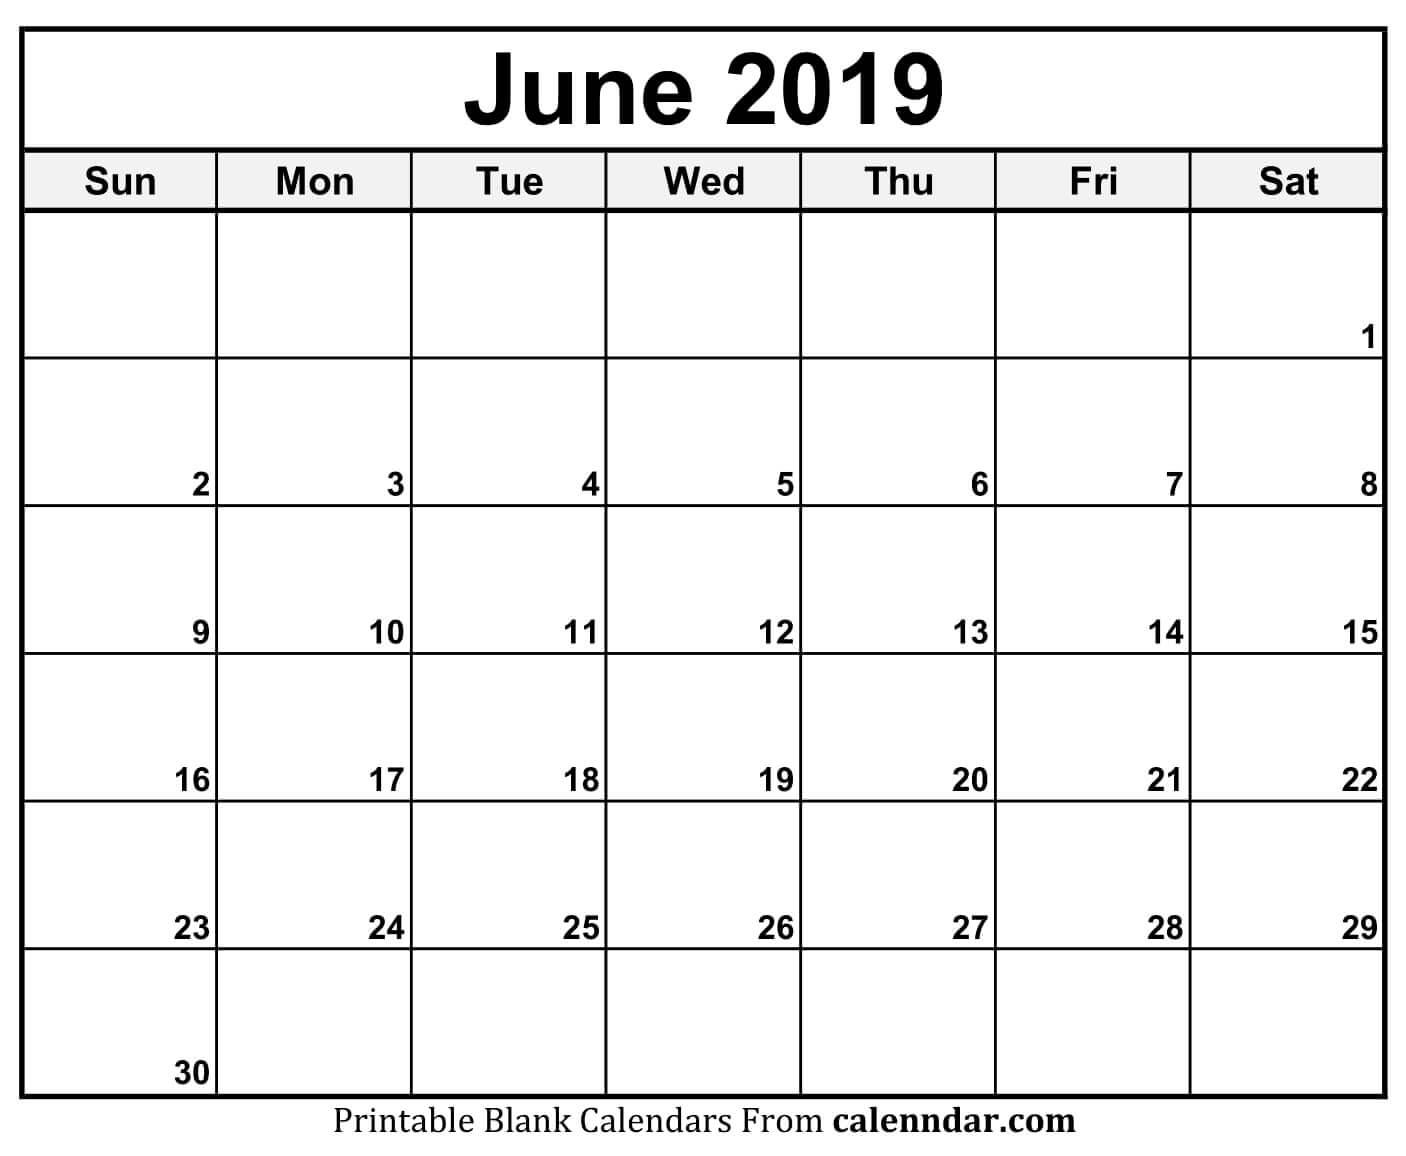 June 2019 Calendar Blank Template